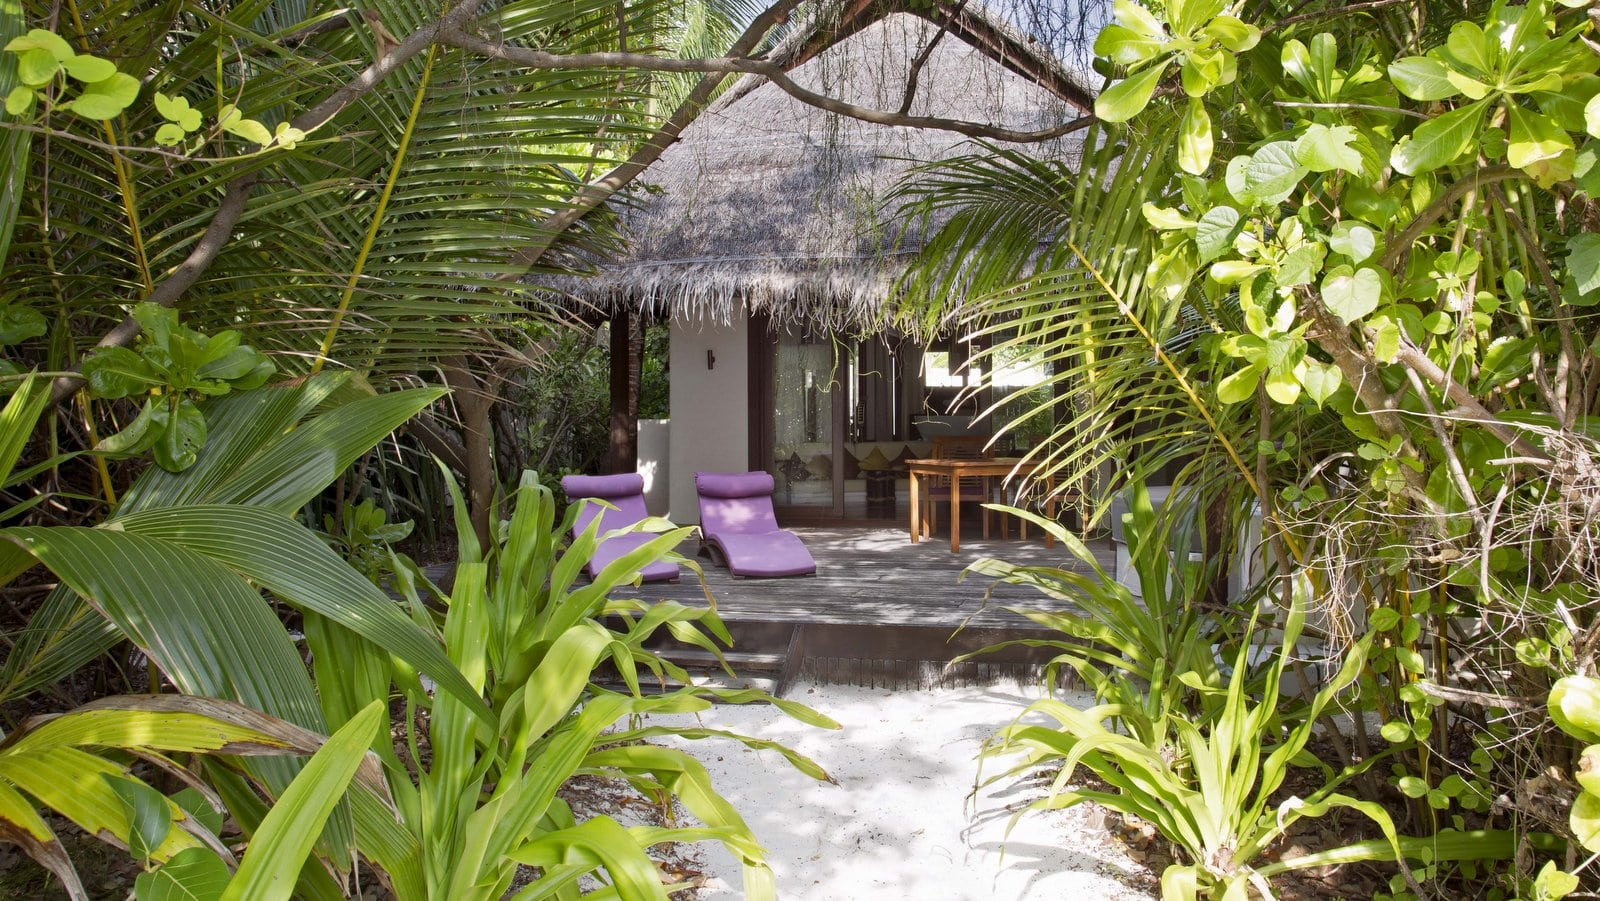 Мальдивы, отель Coco Palm Bodu Hithi, номер Island Villa with Pool